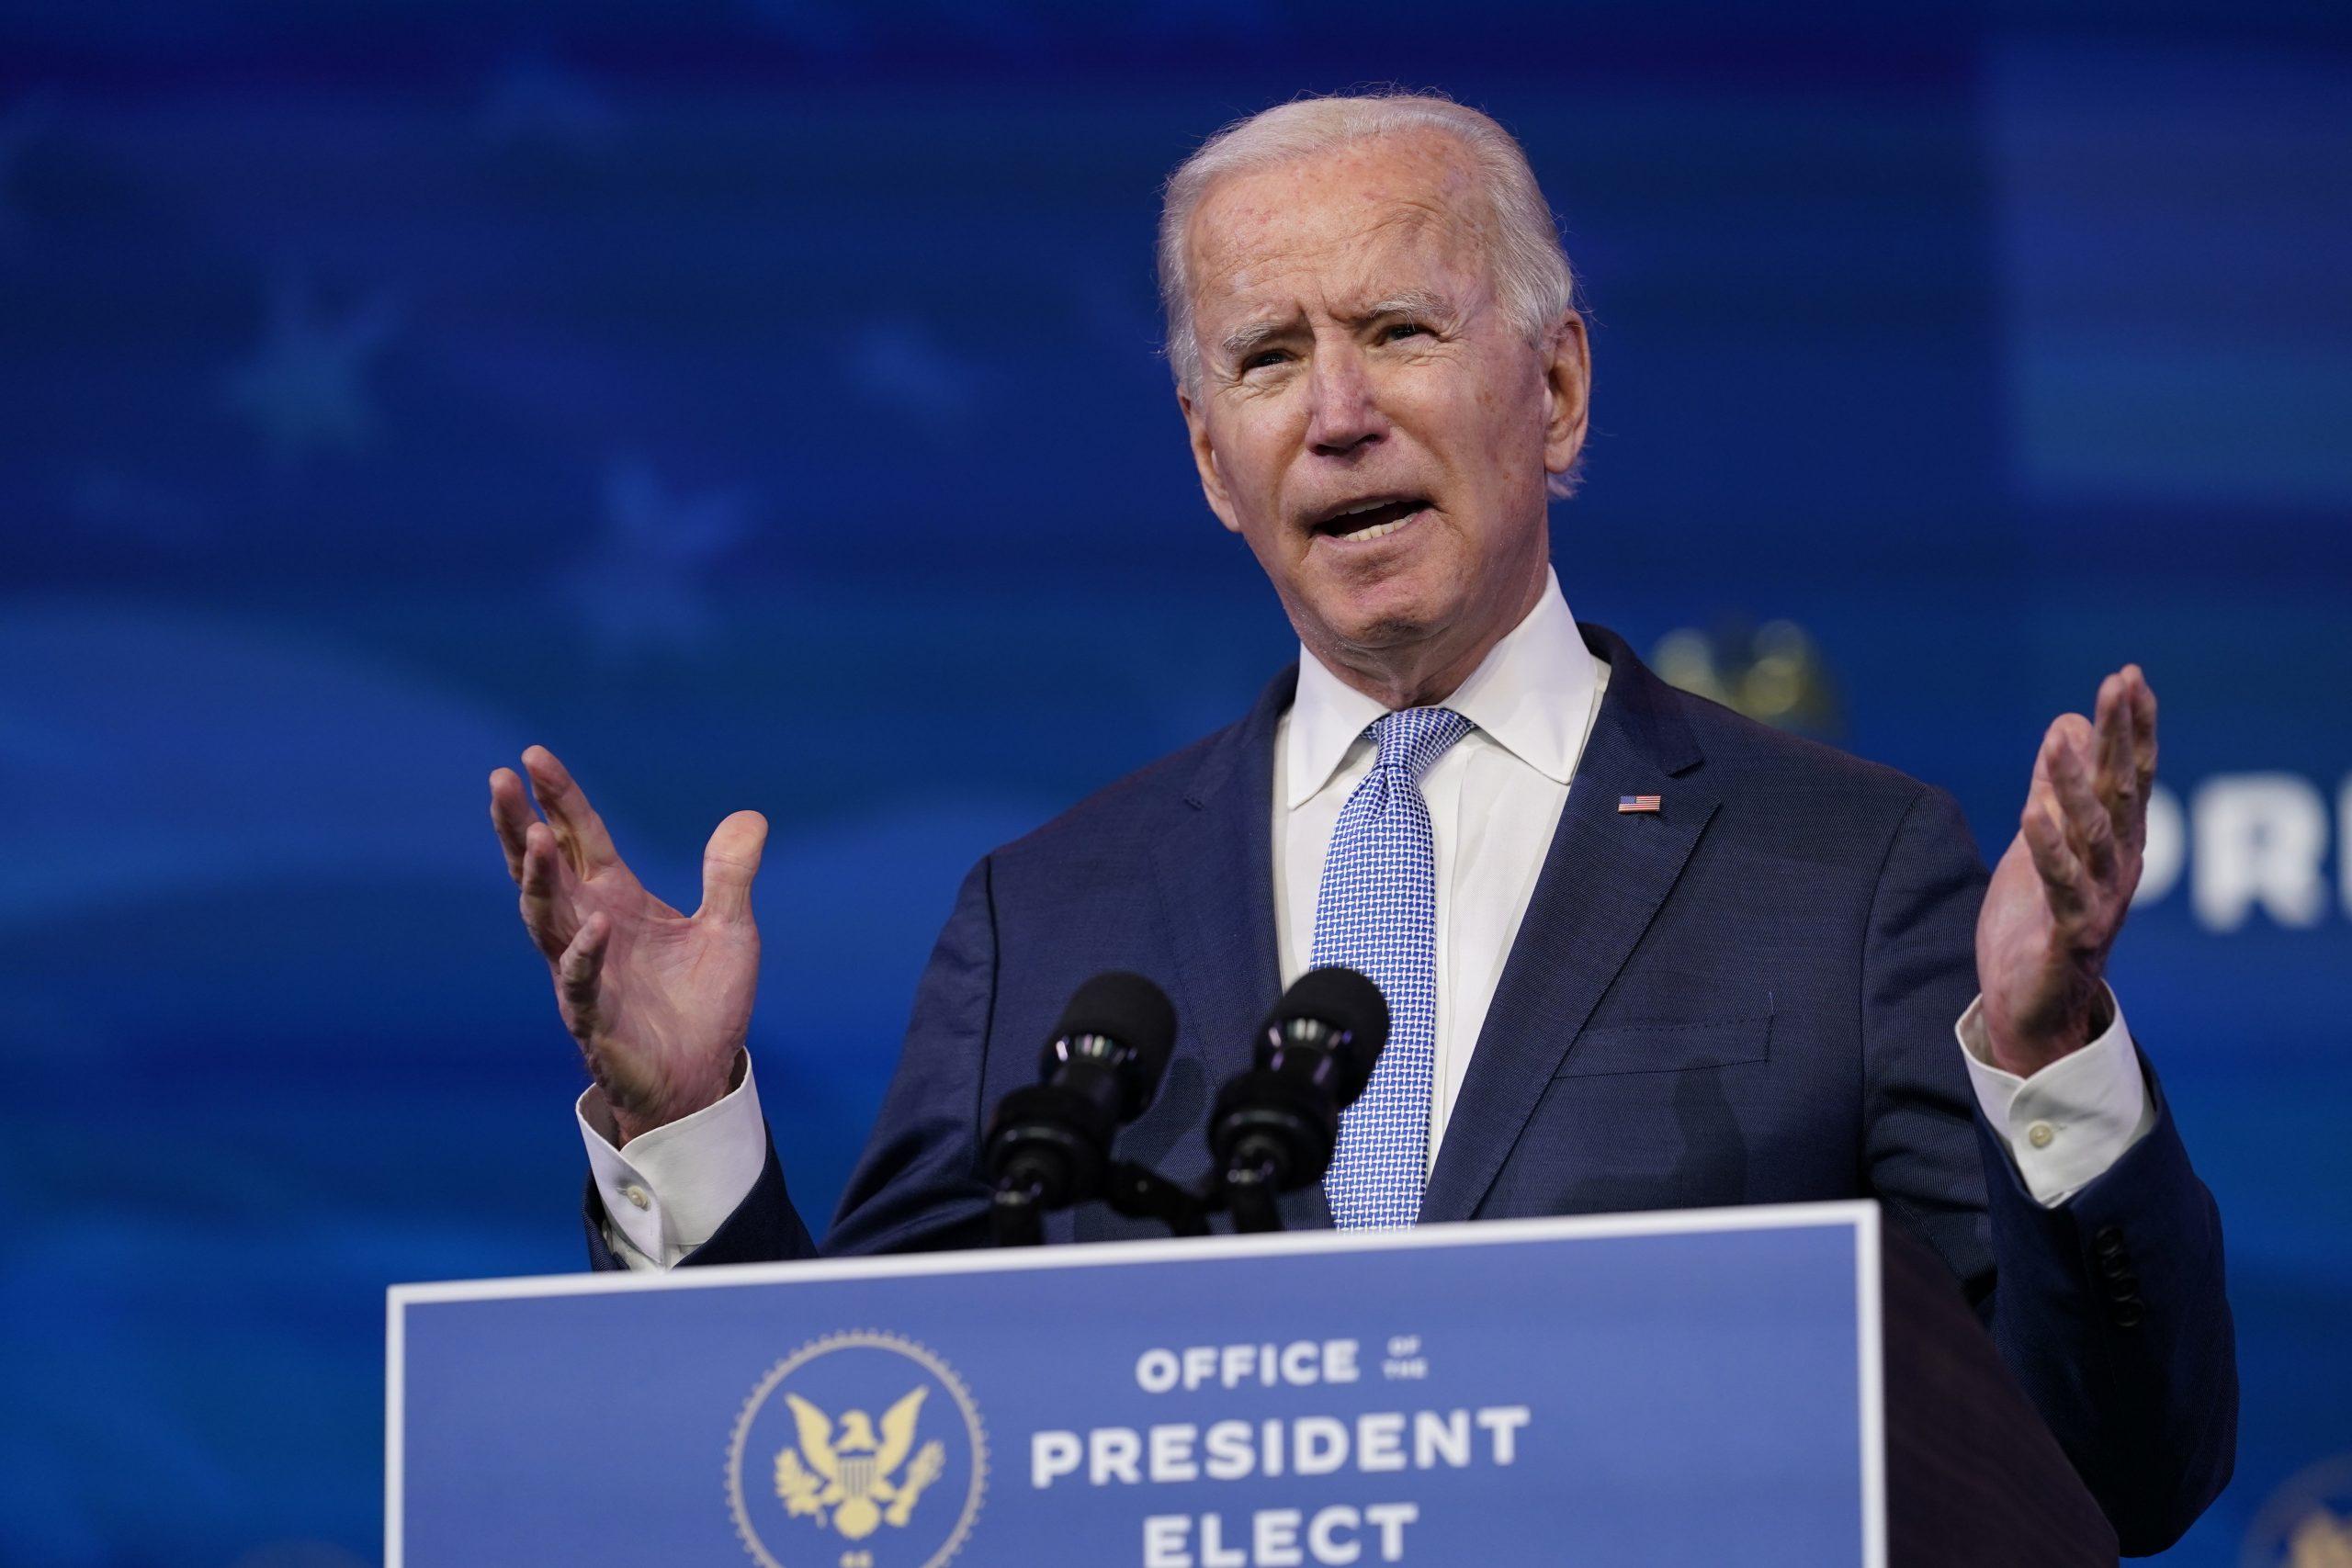 Biden's Chosen Cybersecurity Advisor of Hungarian Jewish Descent